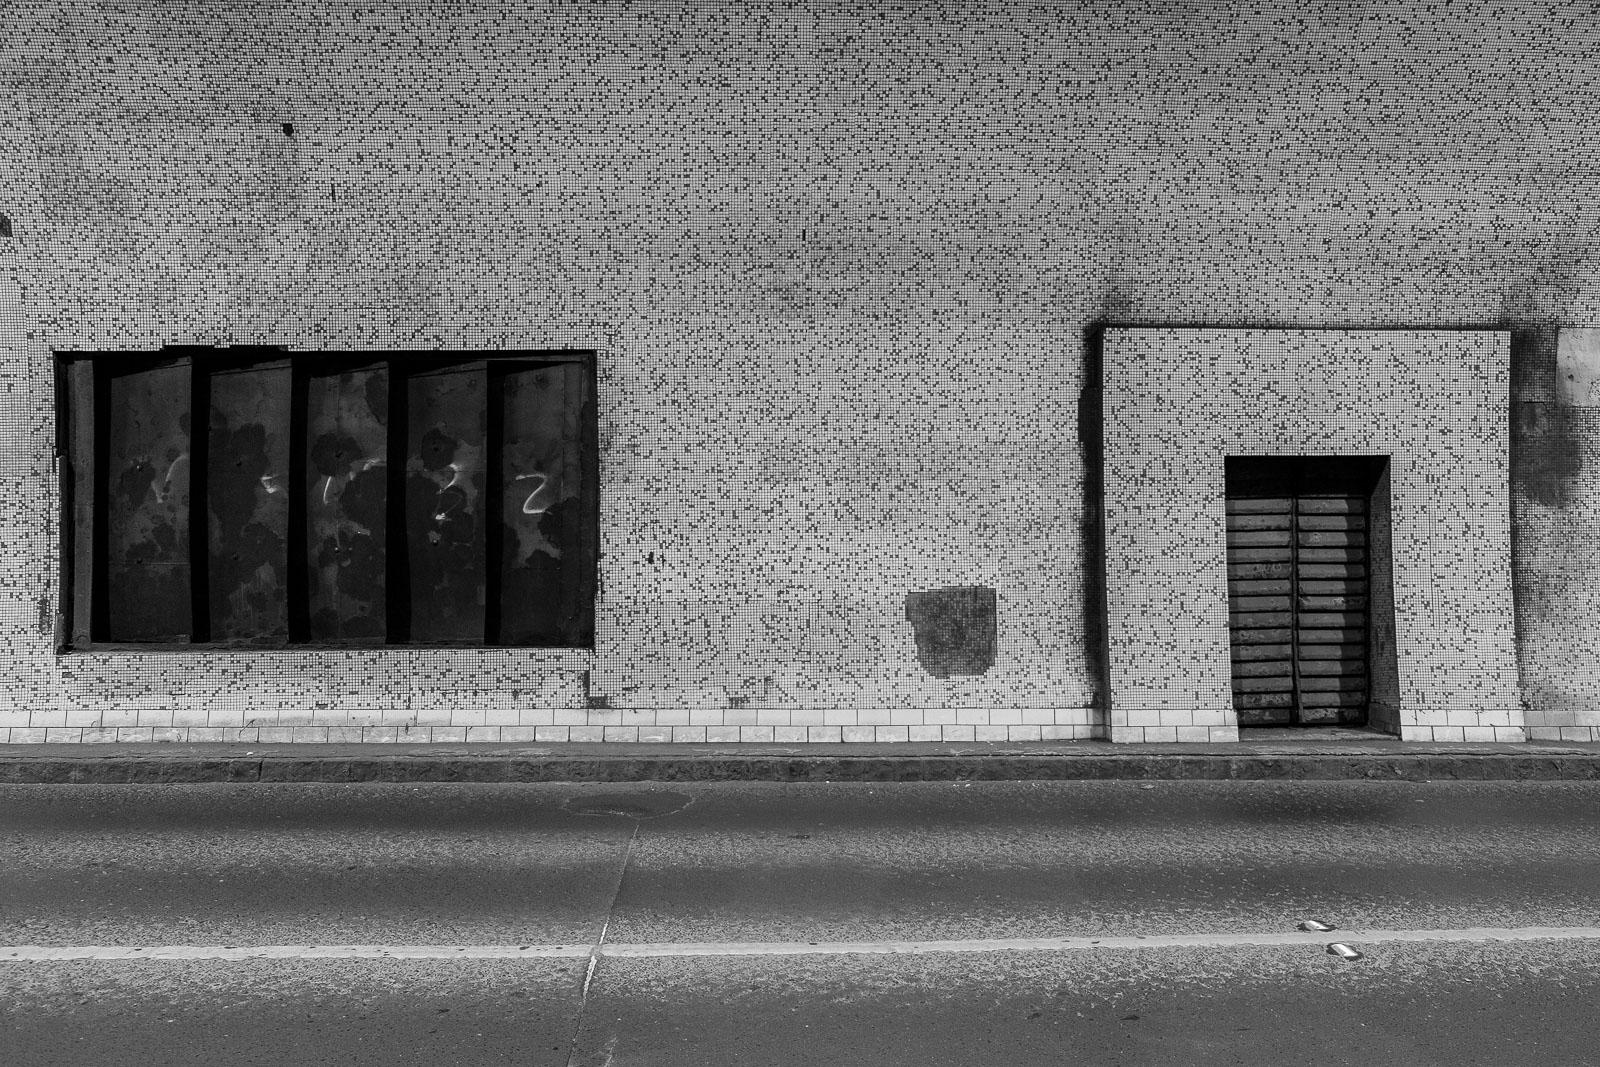 budapest-31.jpg